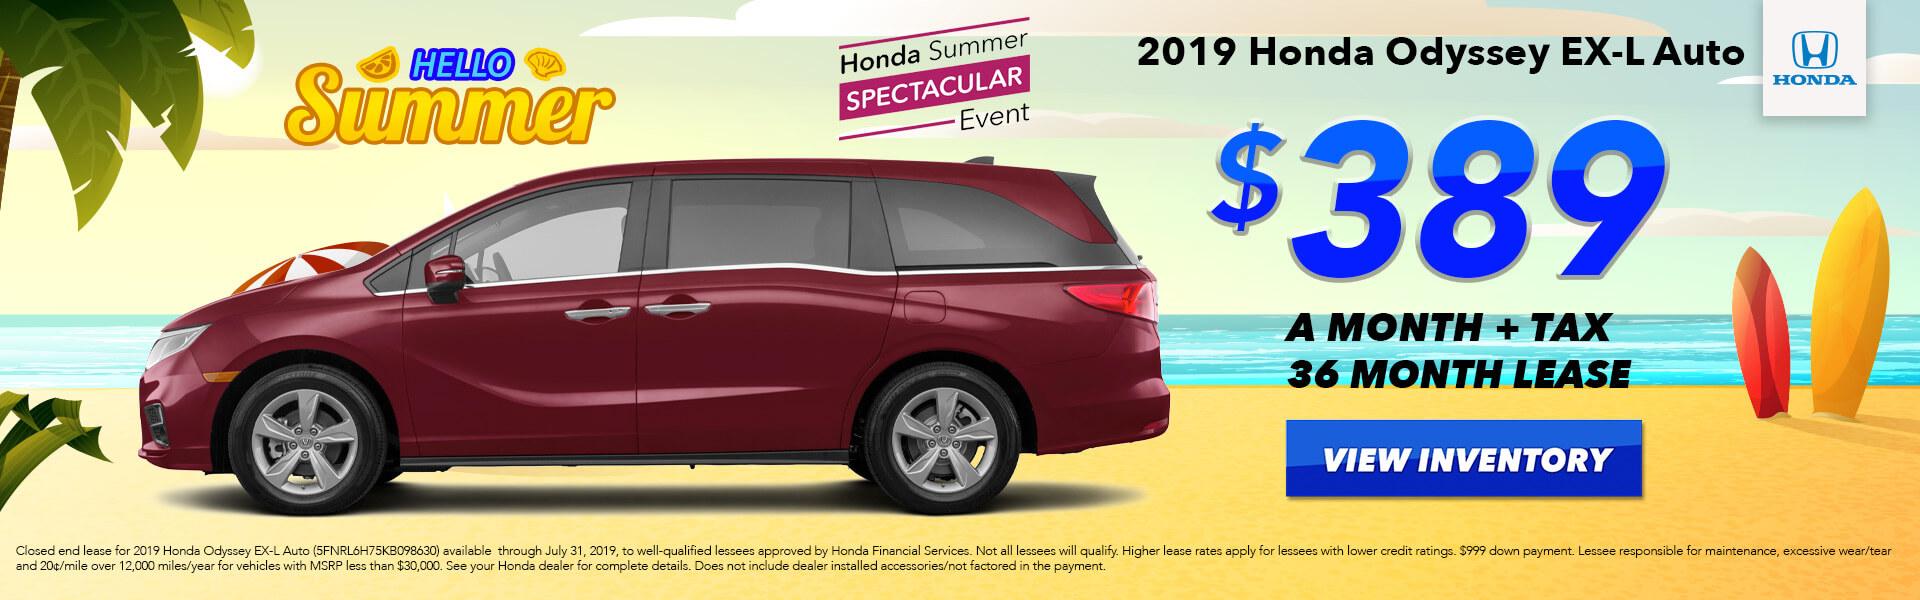 2019 Honda Odyssey Lease for $389